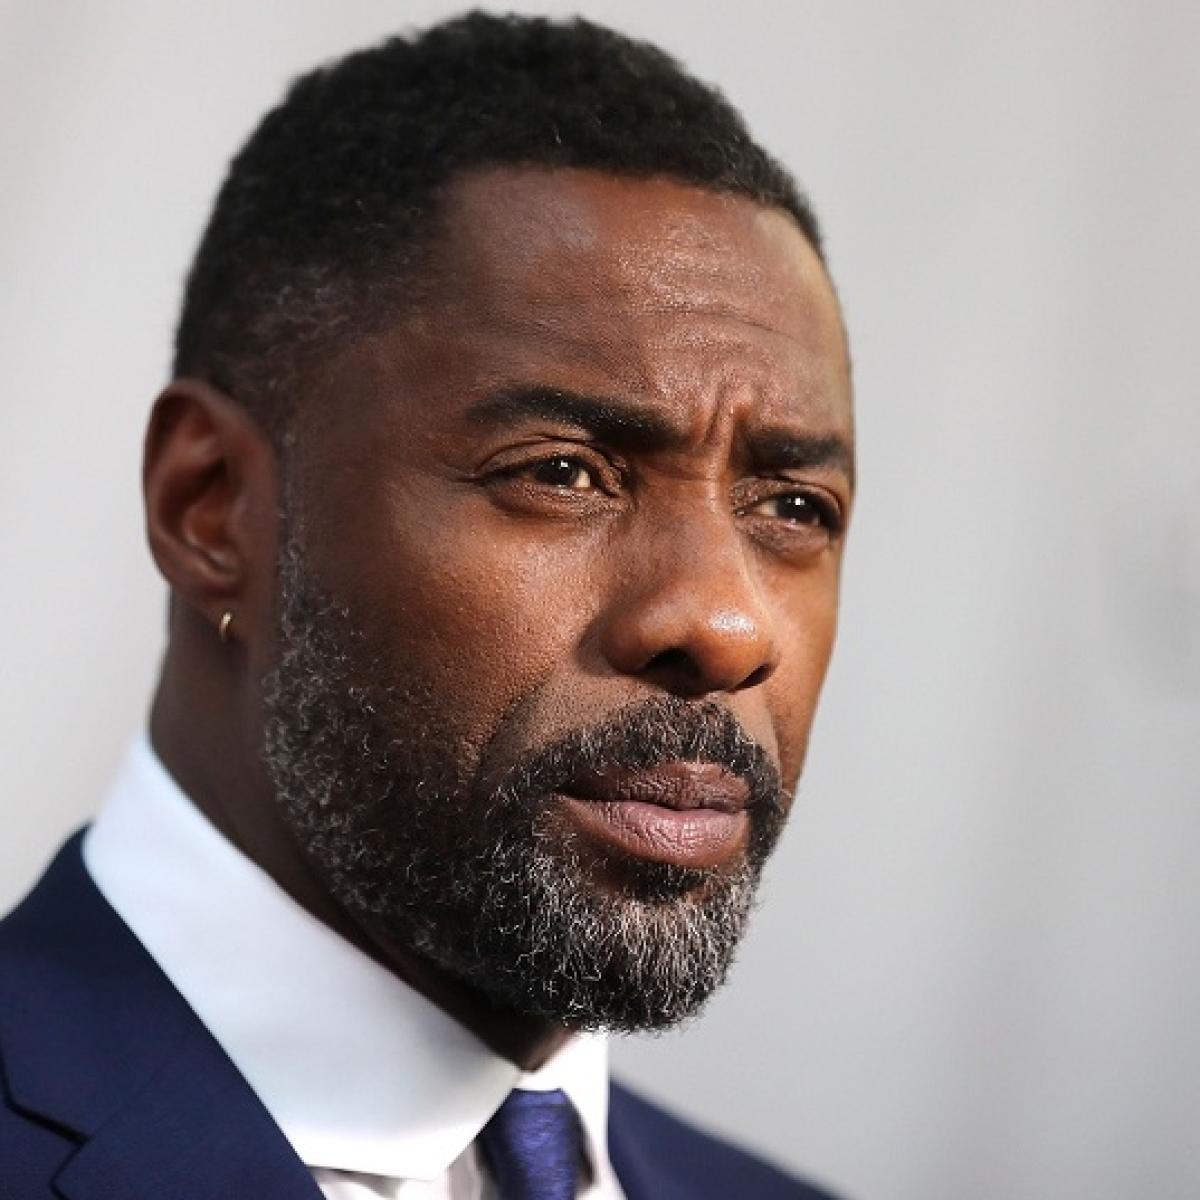 Idris Elba says success has not made him immune to racism